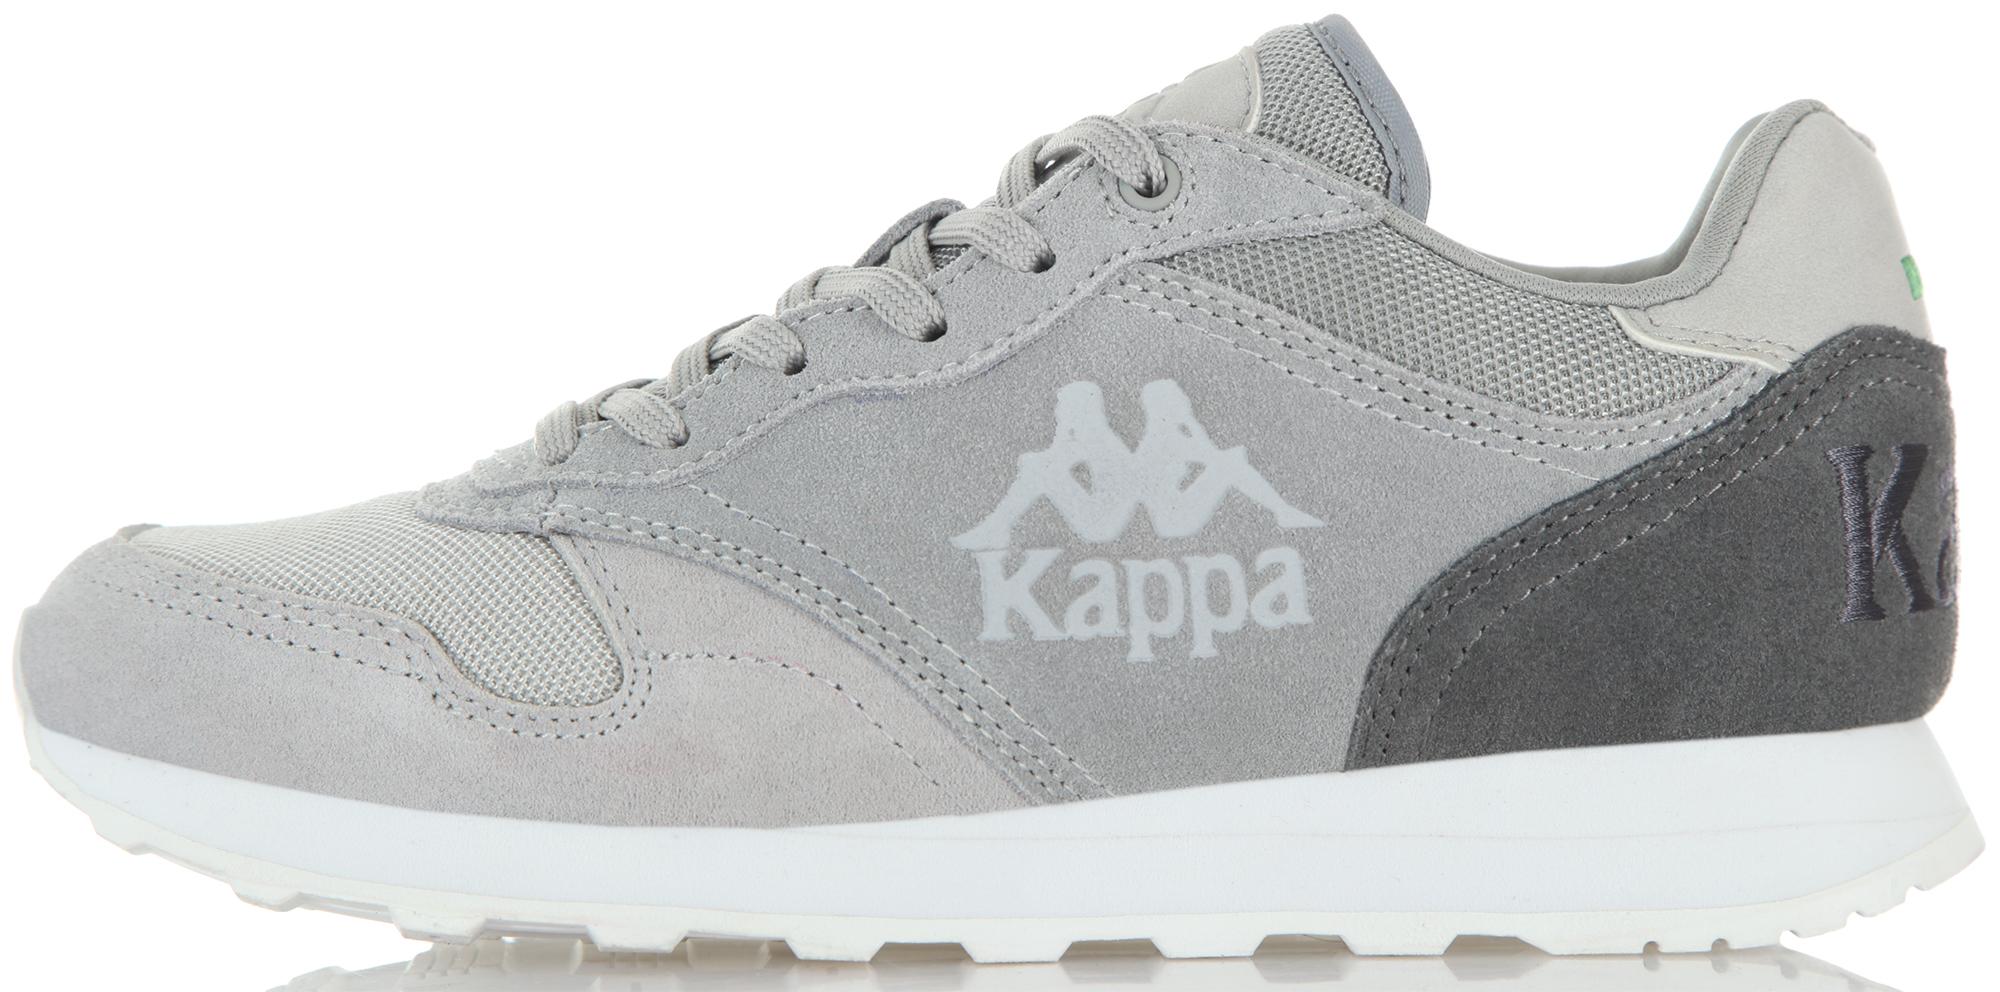 Kappa Кроссовки женские Kappa Authentic Run, размер 39 kappa кроссовки женские kappa linea